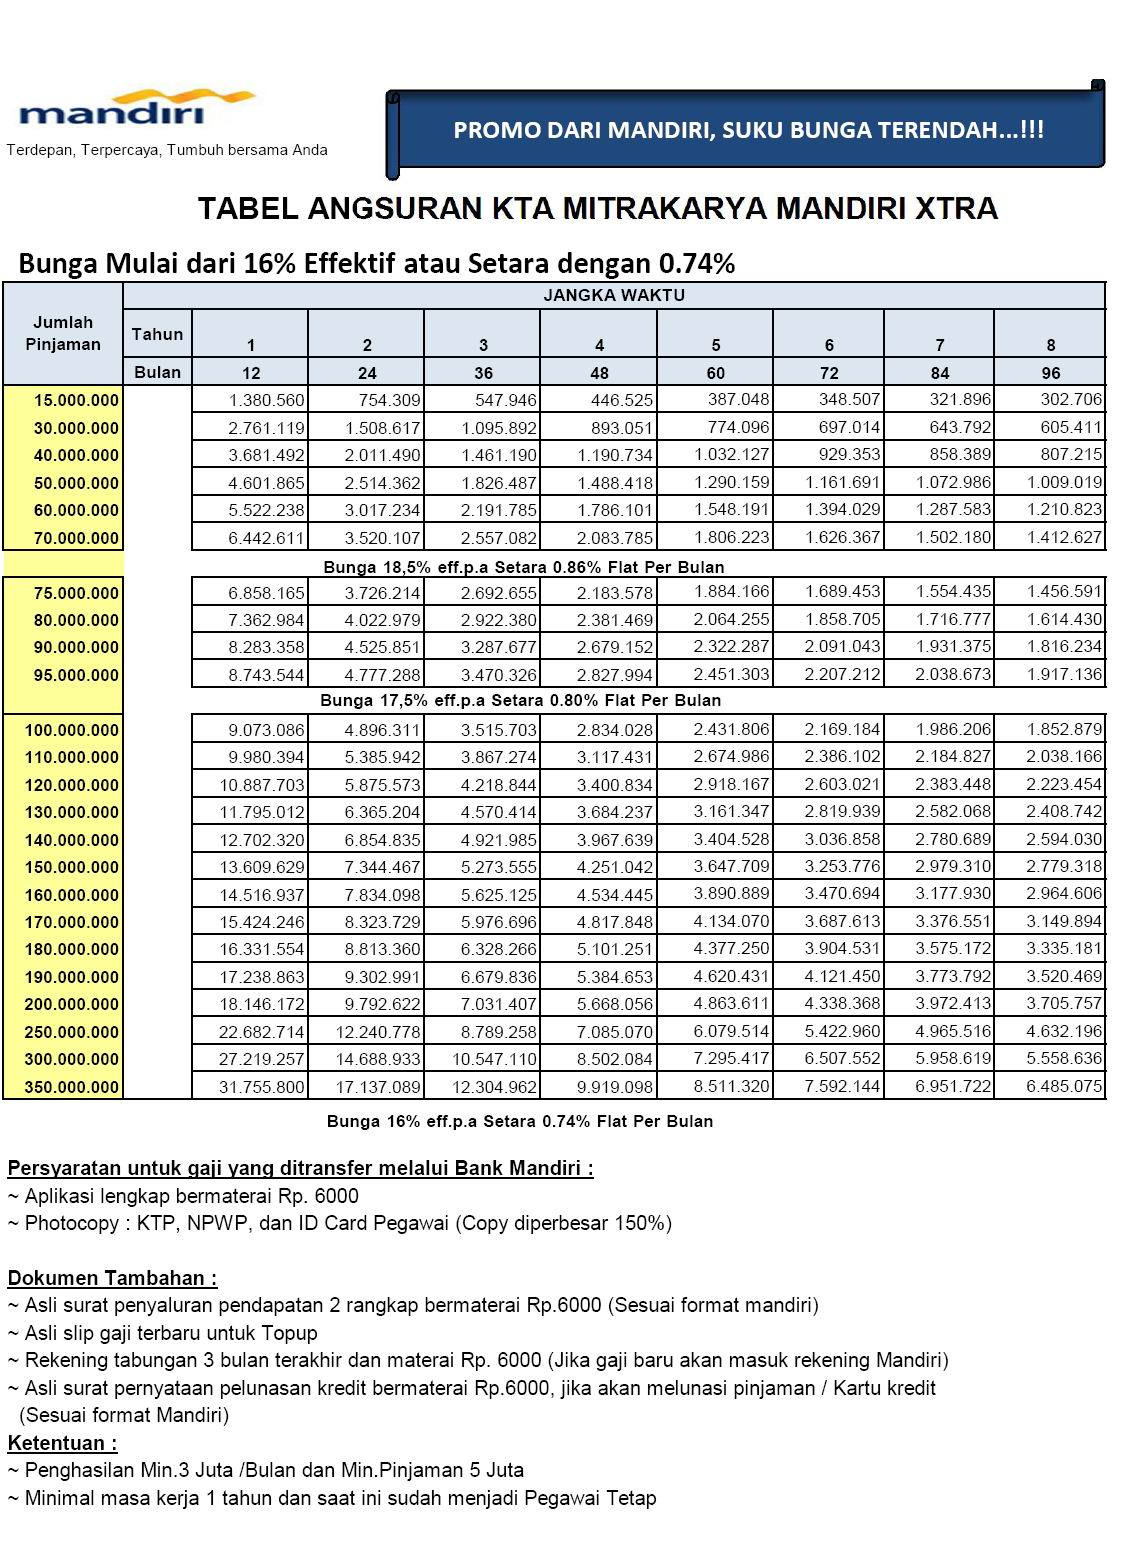 Tabel angsuran cicilan KTA Mandiri Mitrakarya 2013